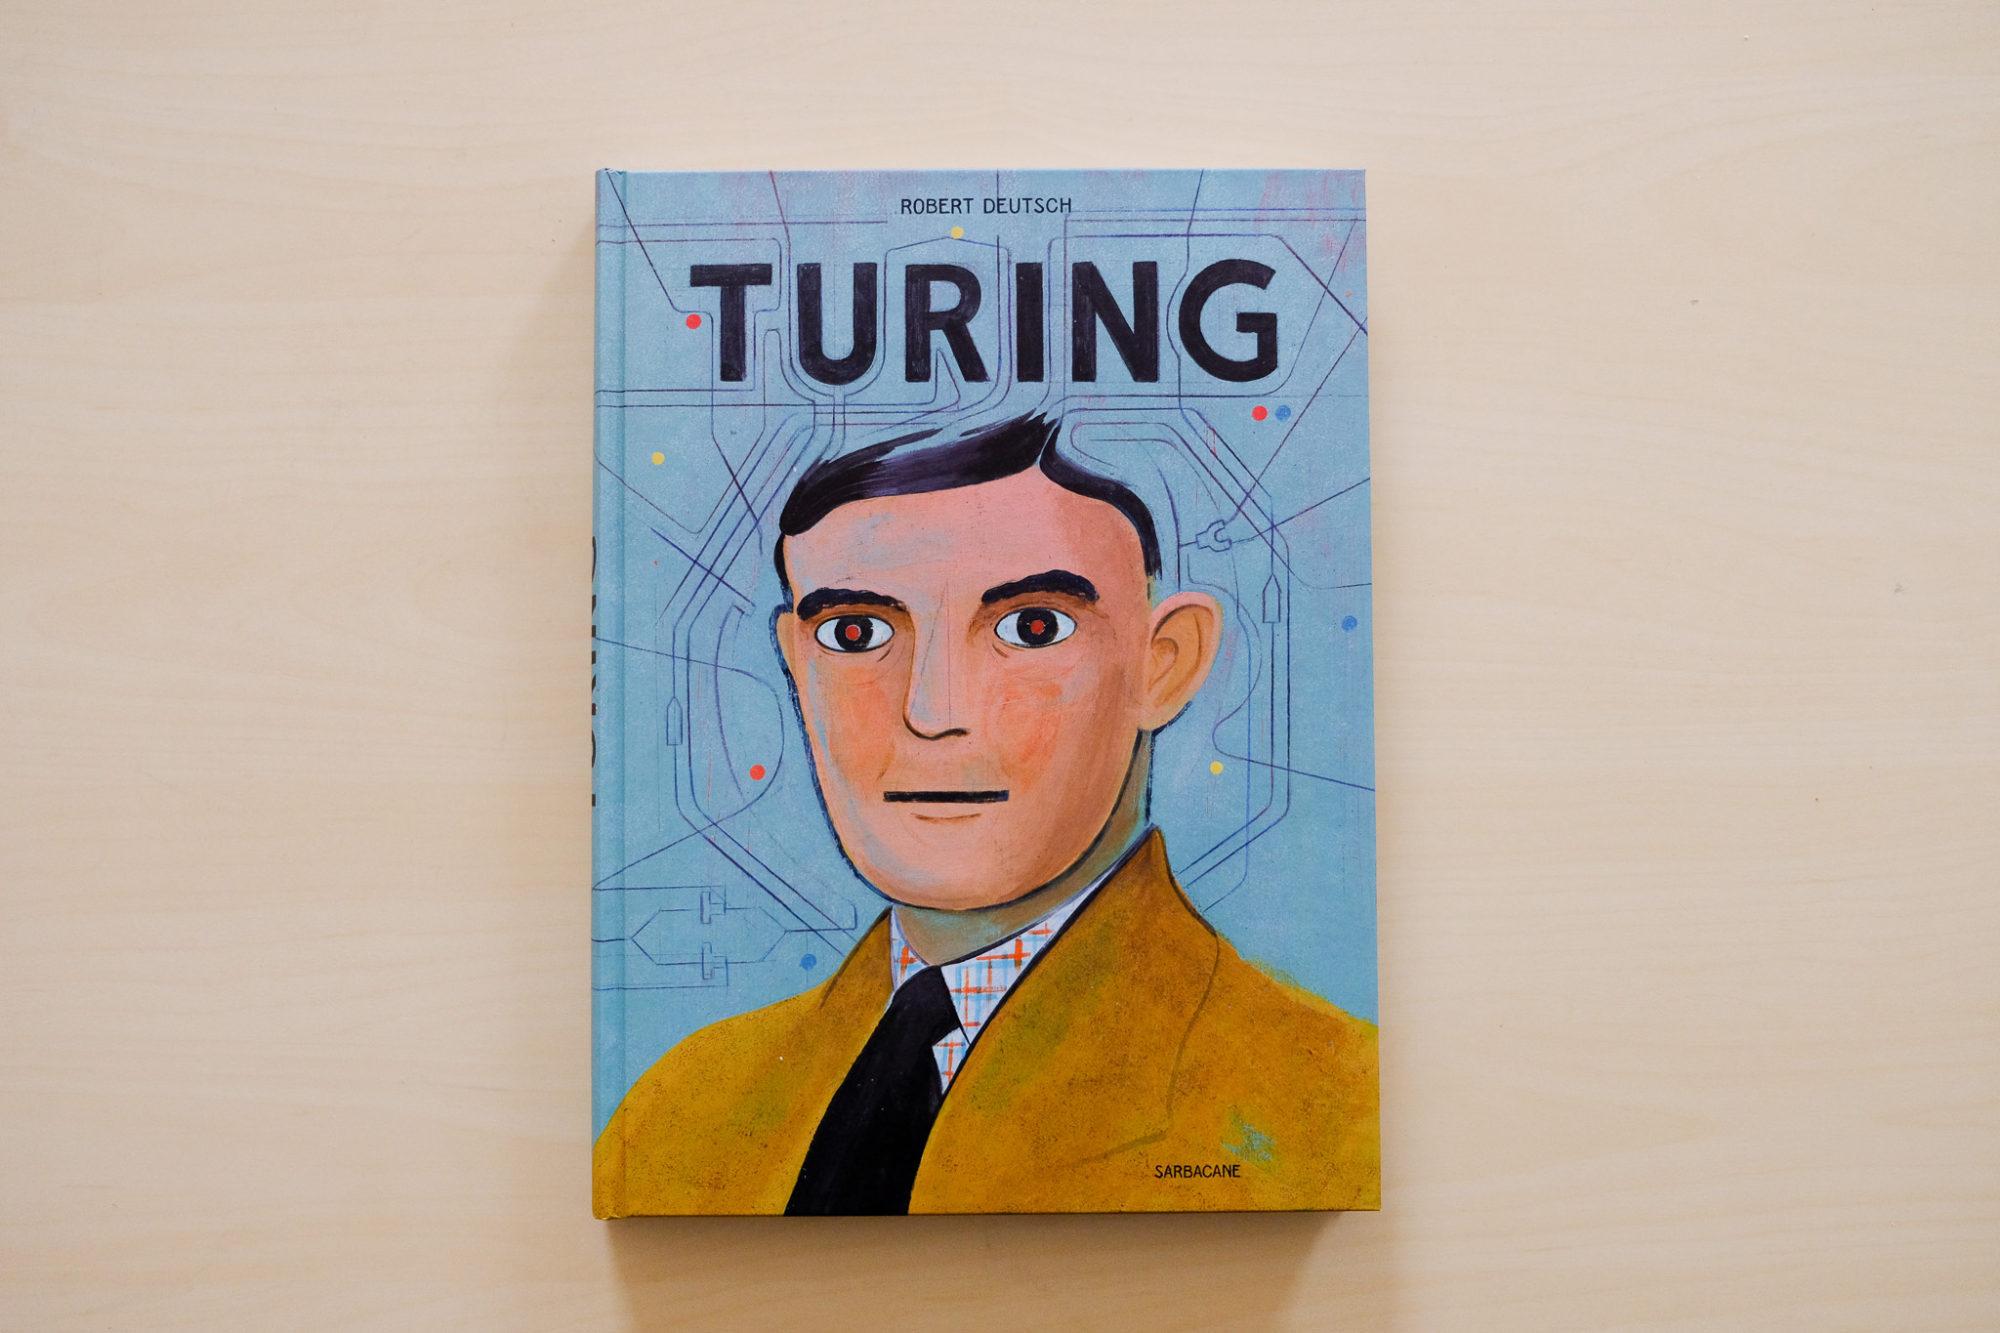 Turing, une bande dessinée touchante par Robert Deutsch